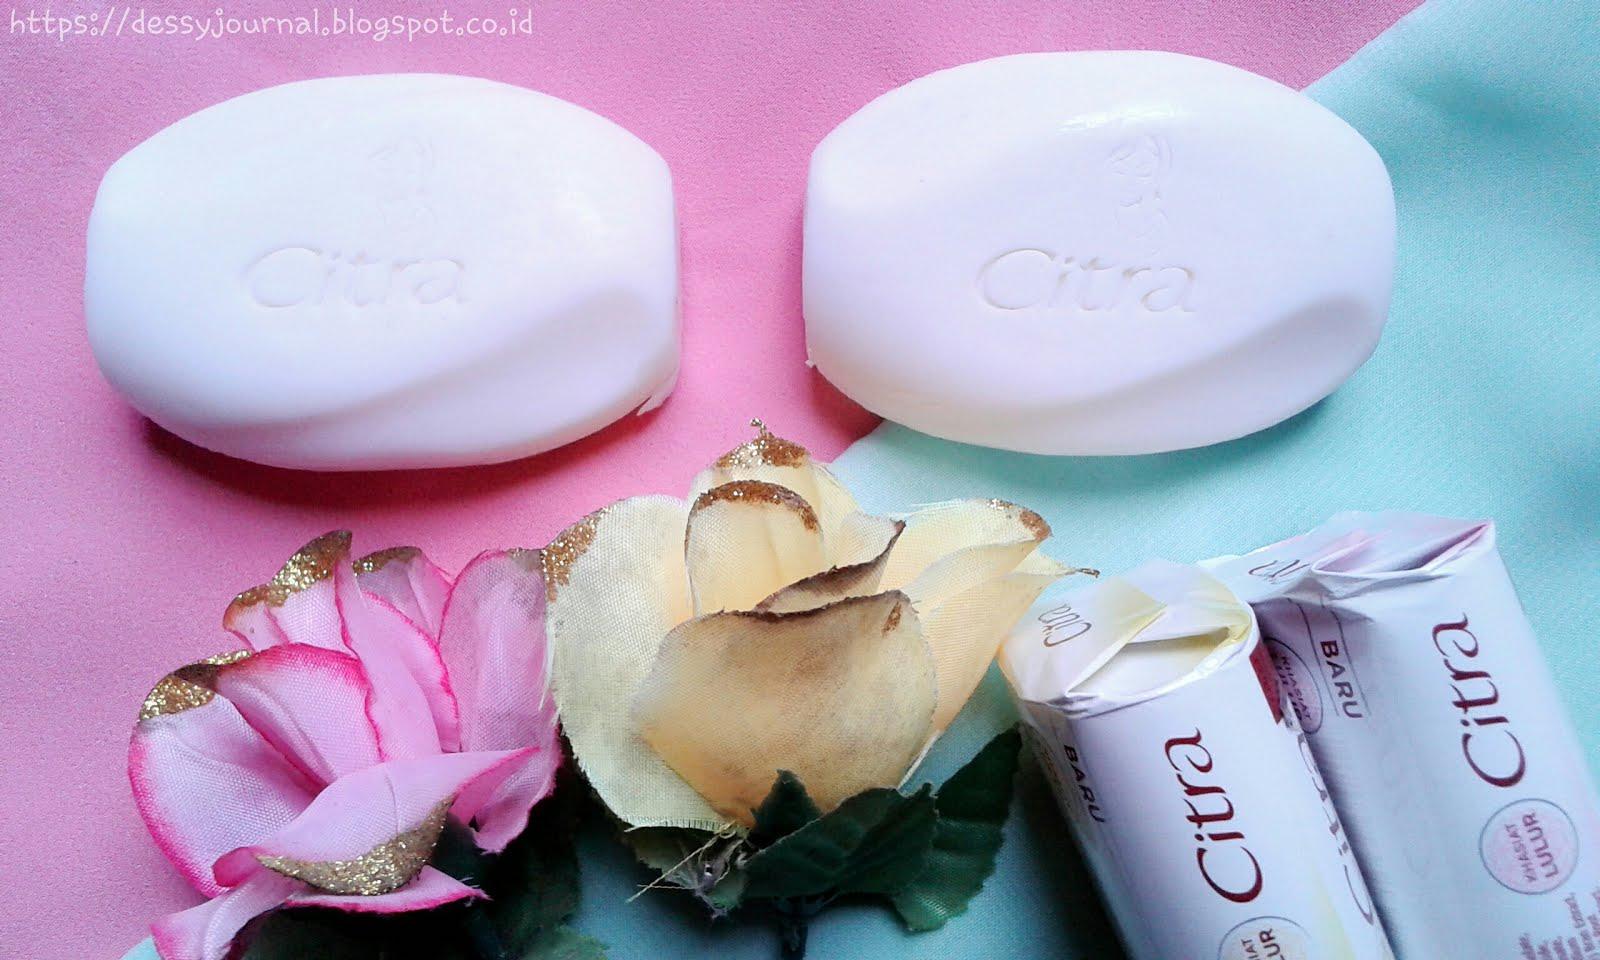 Dessy Journal Review Citra Pearly White Uv Natural Paket Handbody Lotion Dan Sabun Mandi Nempatin Urutan Bungkusnya Kebalik